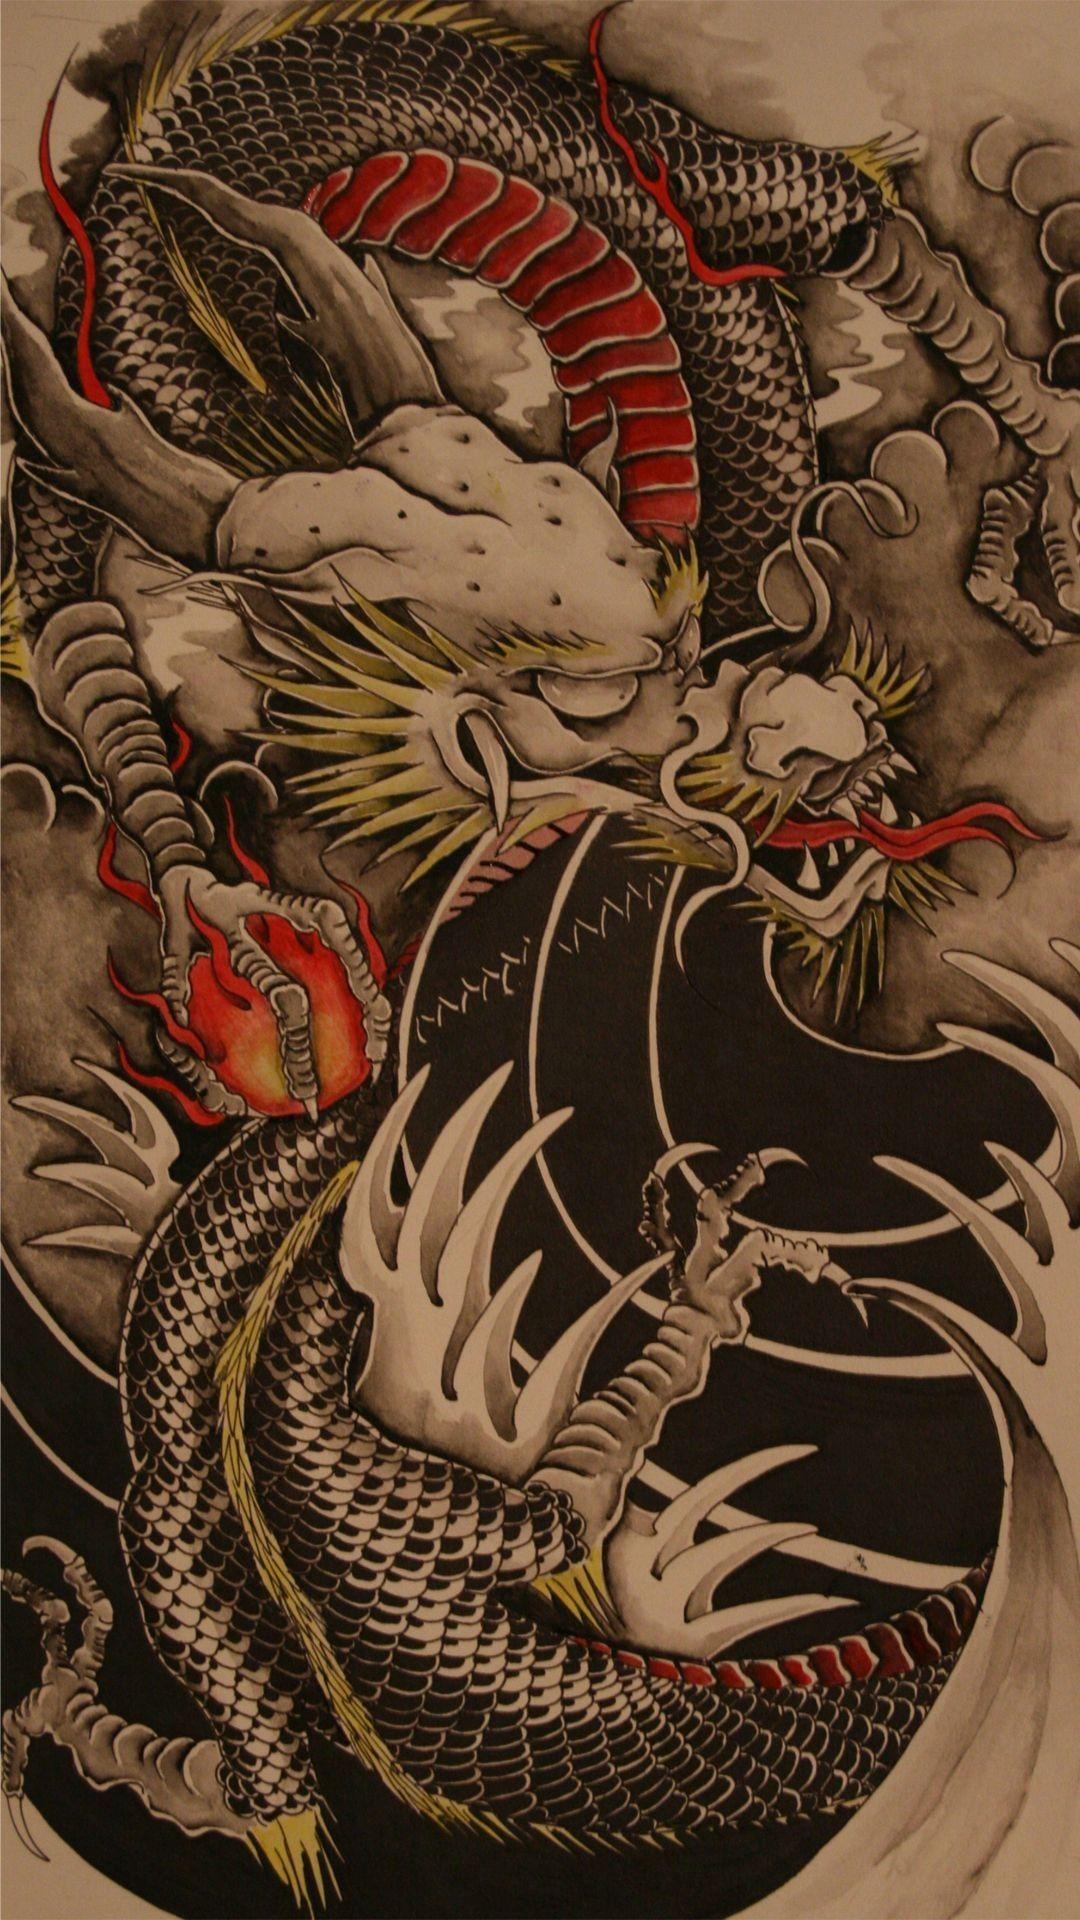 1080x1920 Chinese Dragon Wallpaper Dragon Tattoo Art Dragon Illustration Japanese Dragon Tattoos